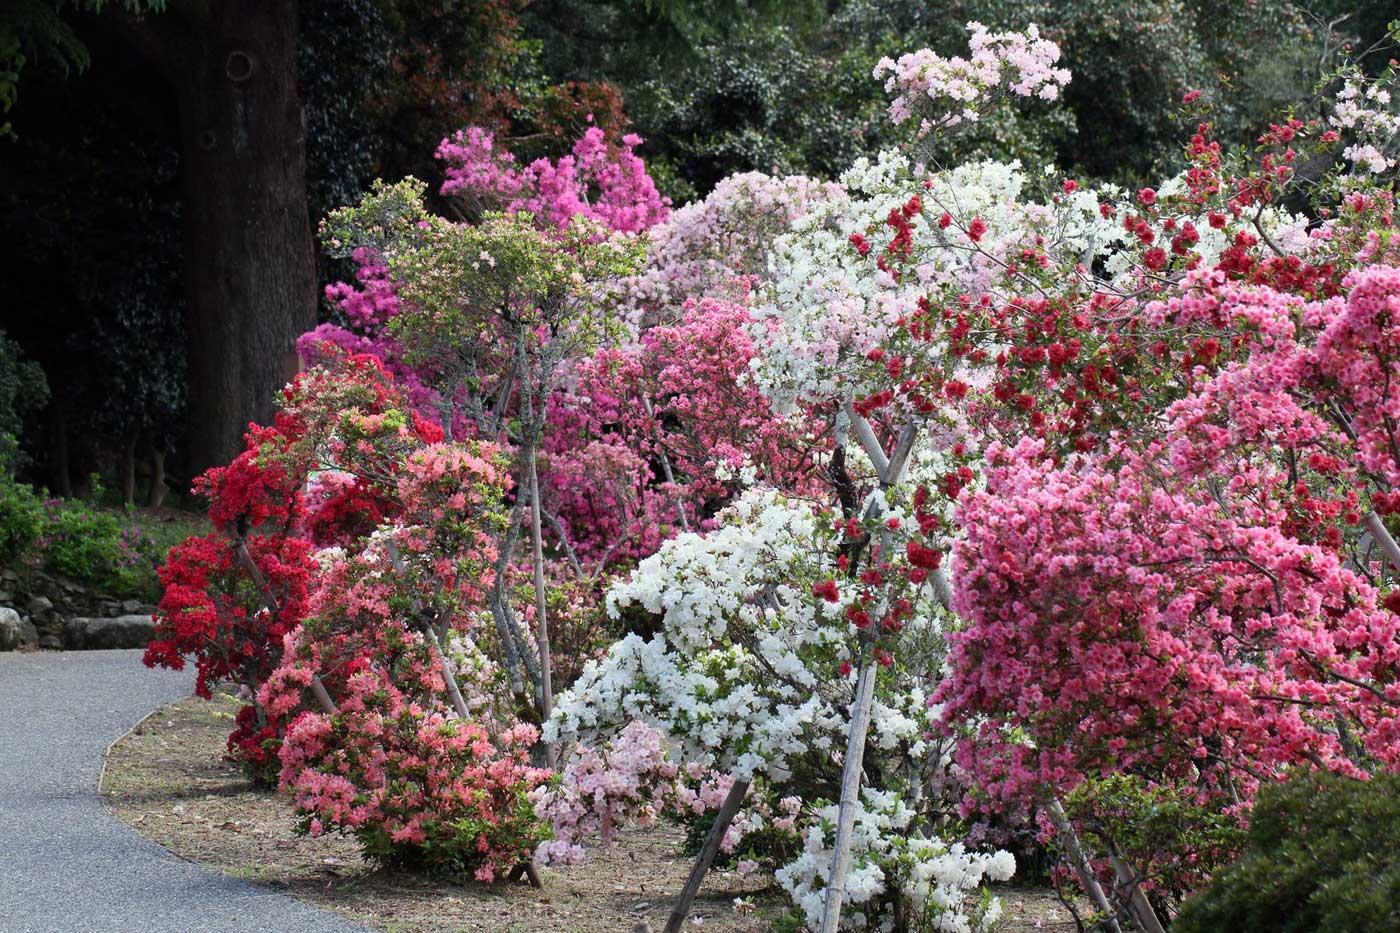 Colorful Kurume azaleas displayed in a garden near Fukuoka.